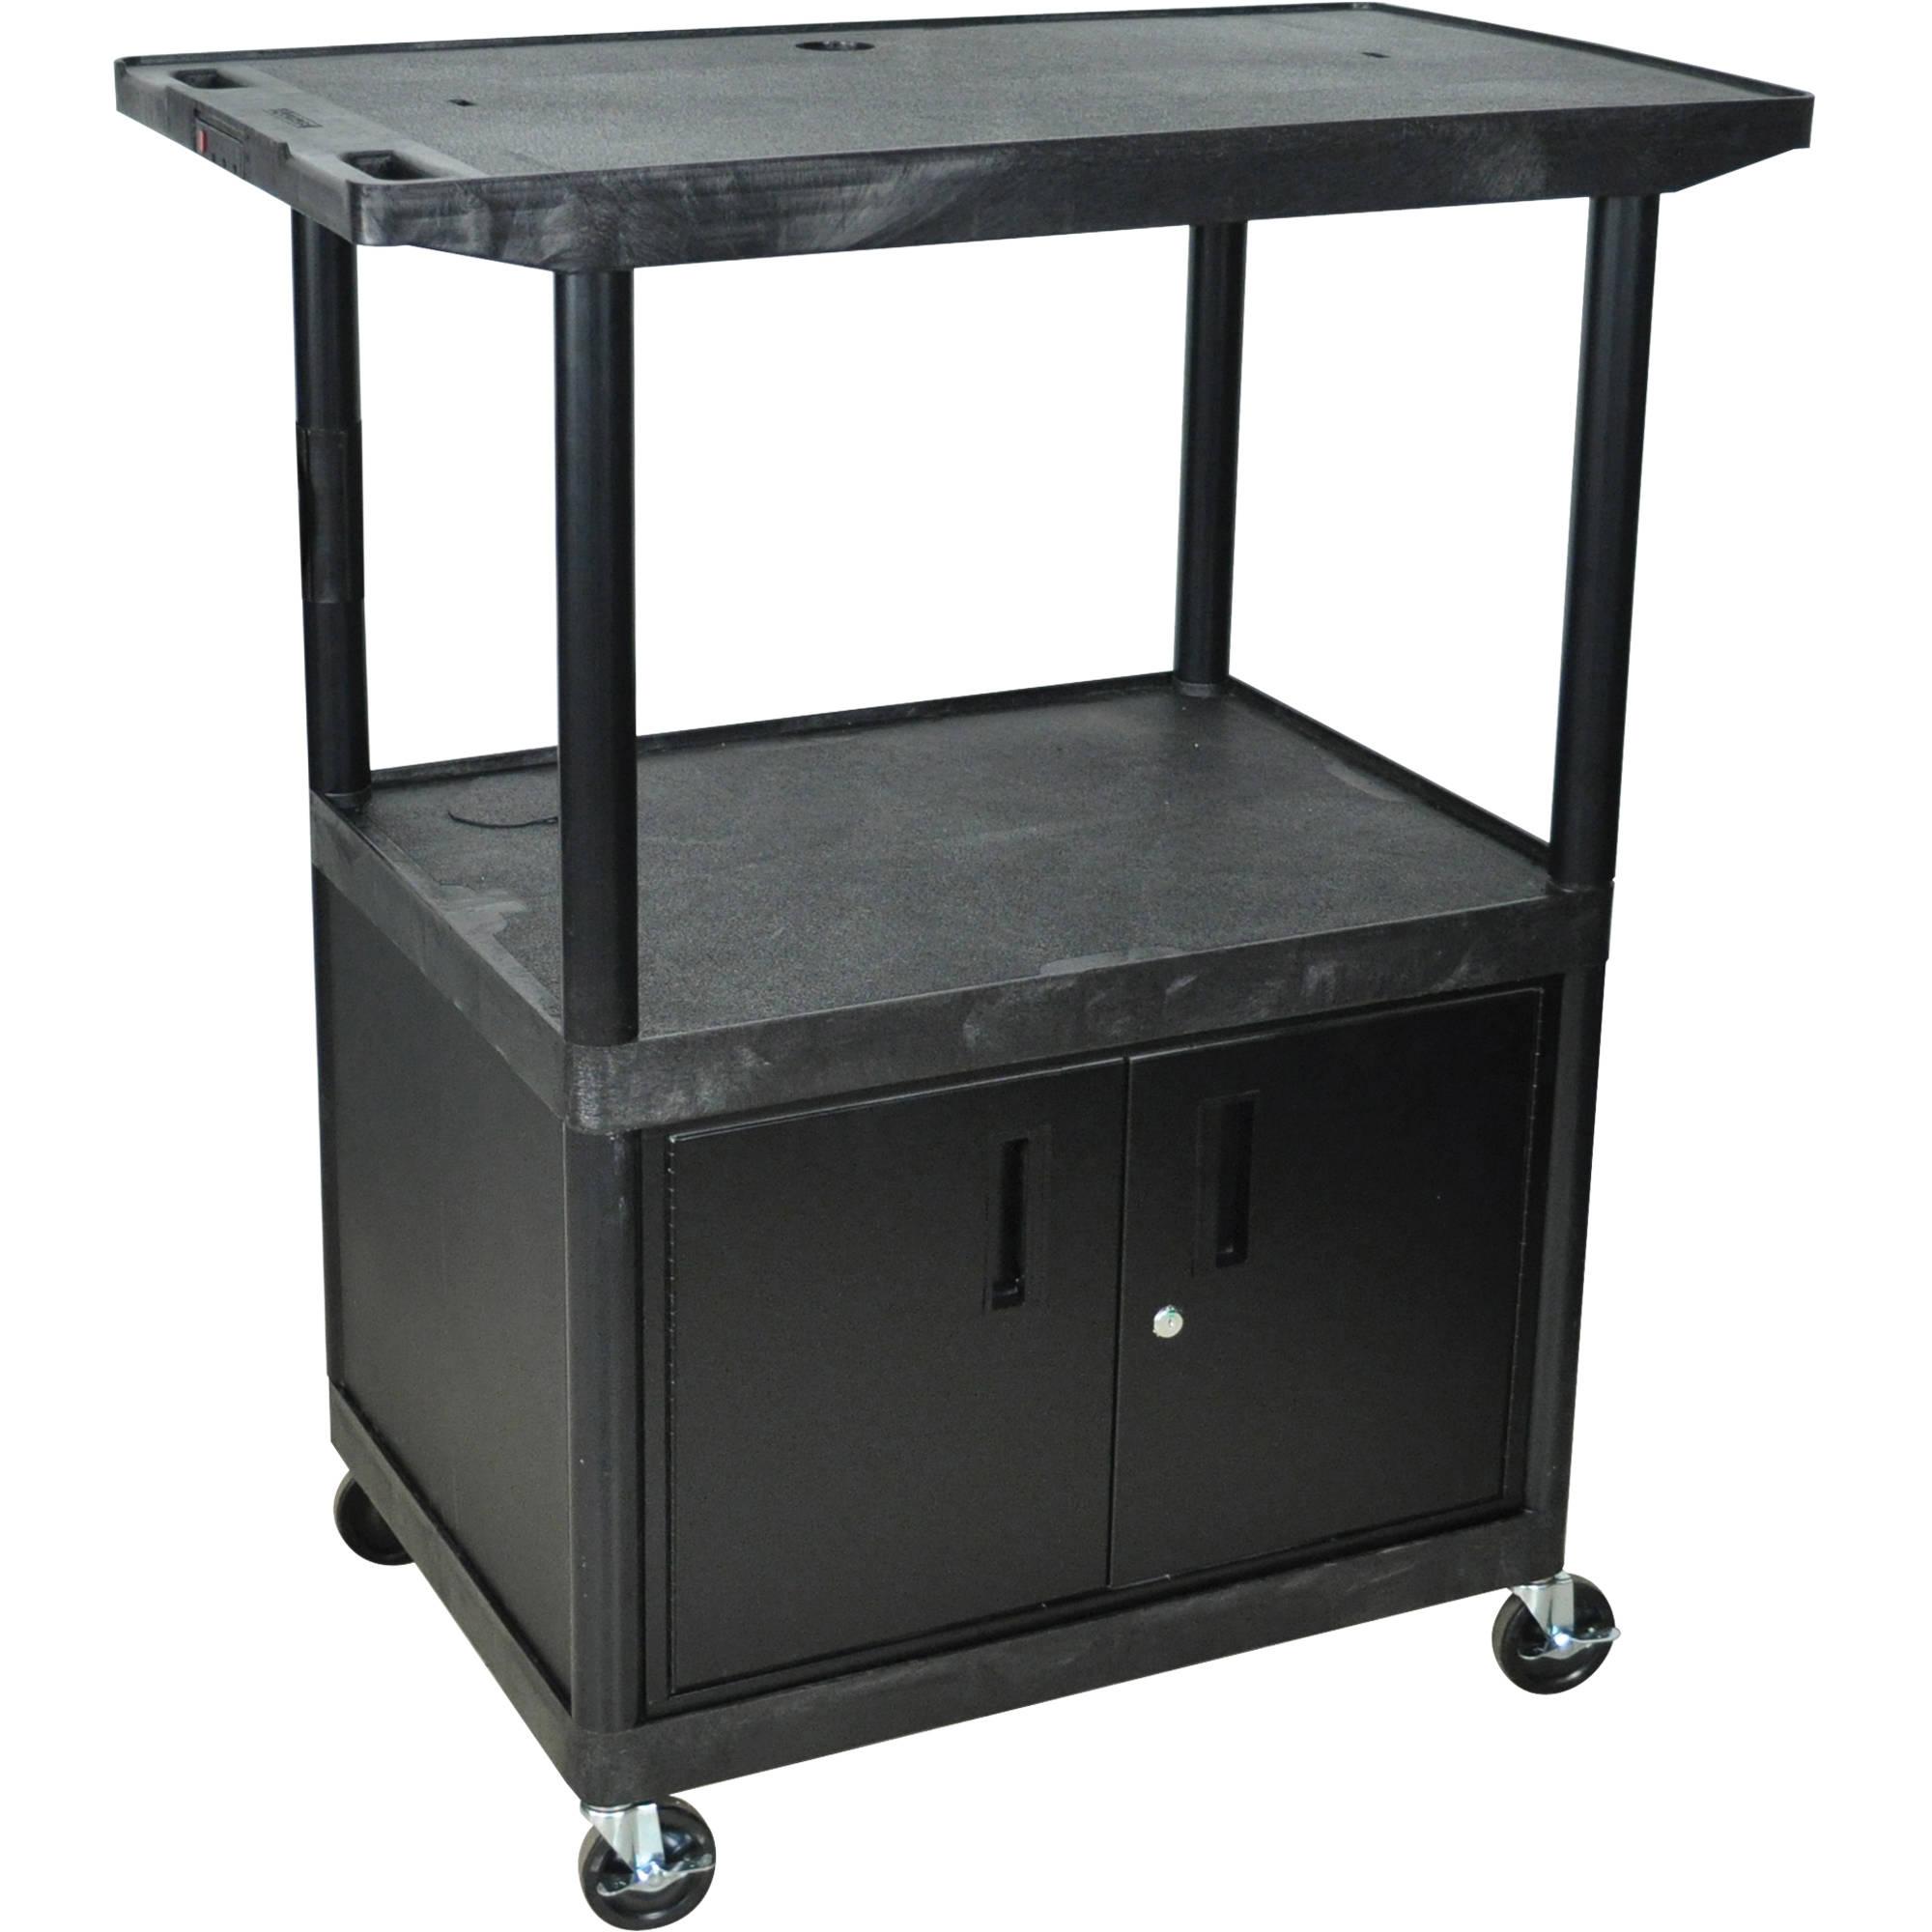 "Luxor Kitchen Cabinets: Luxor 48"" (H) 3-Shelf Plasma TV Table W/Cabinet LE48CWT-B"